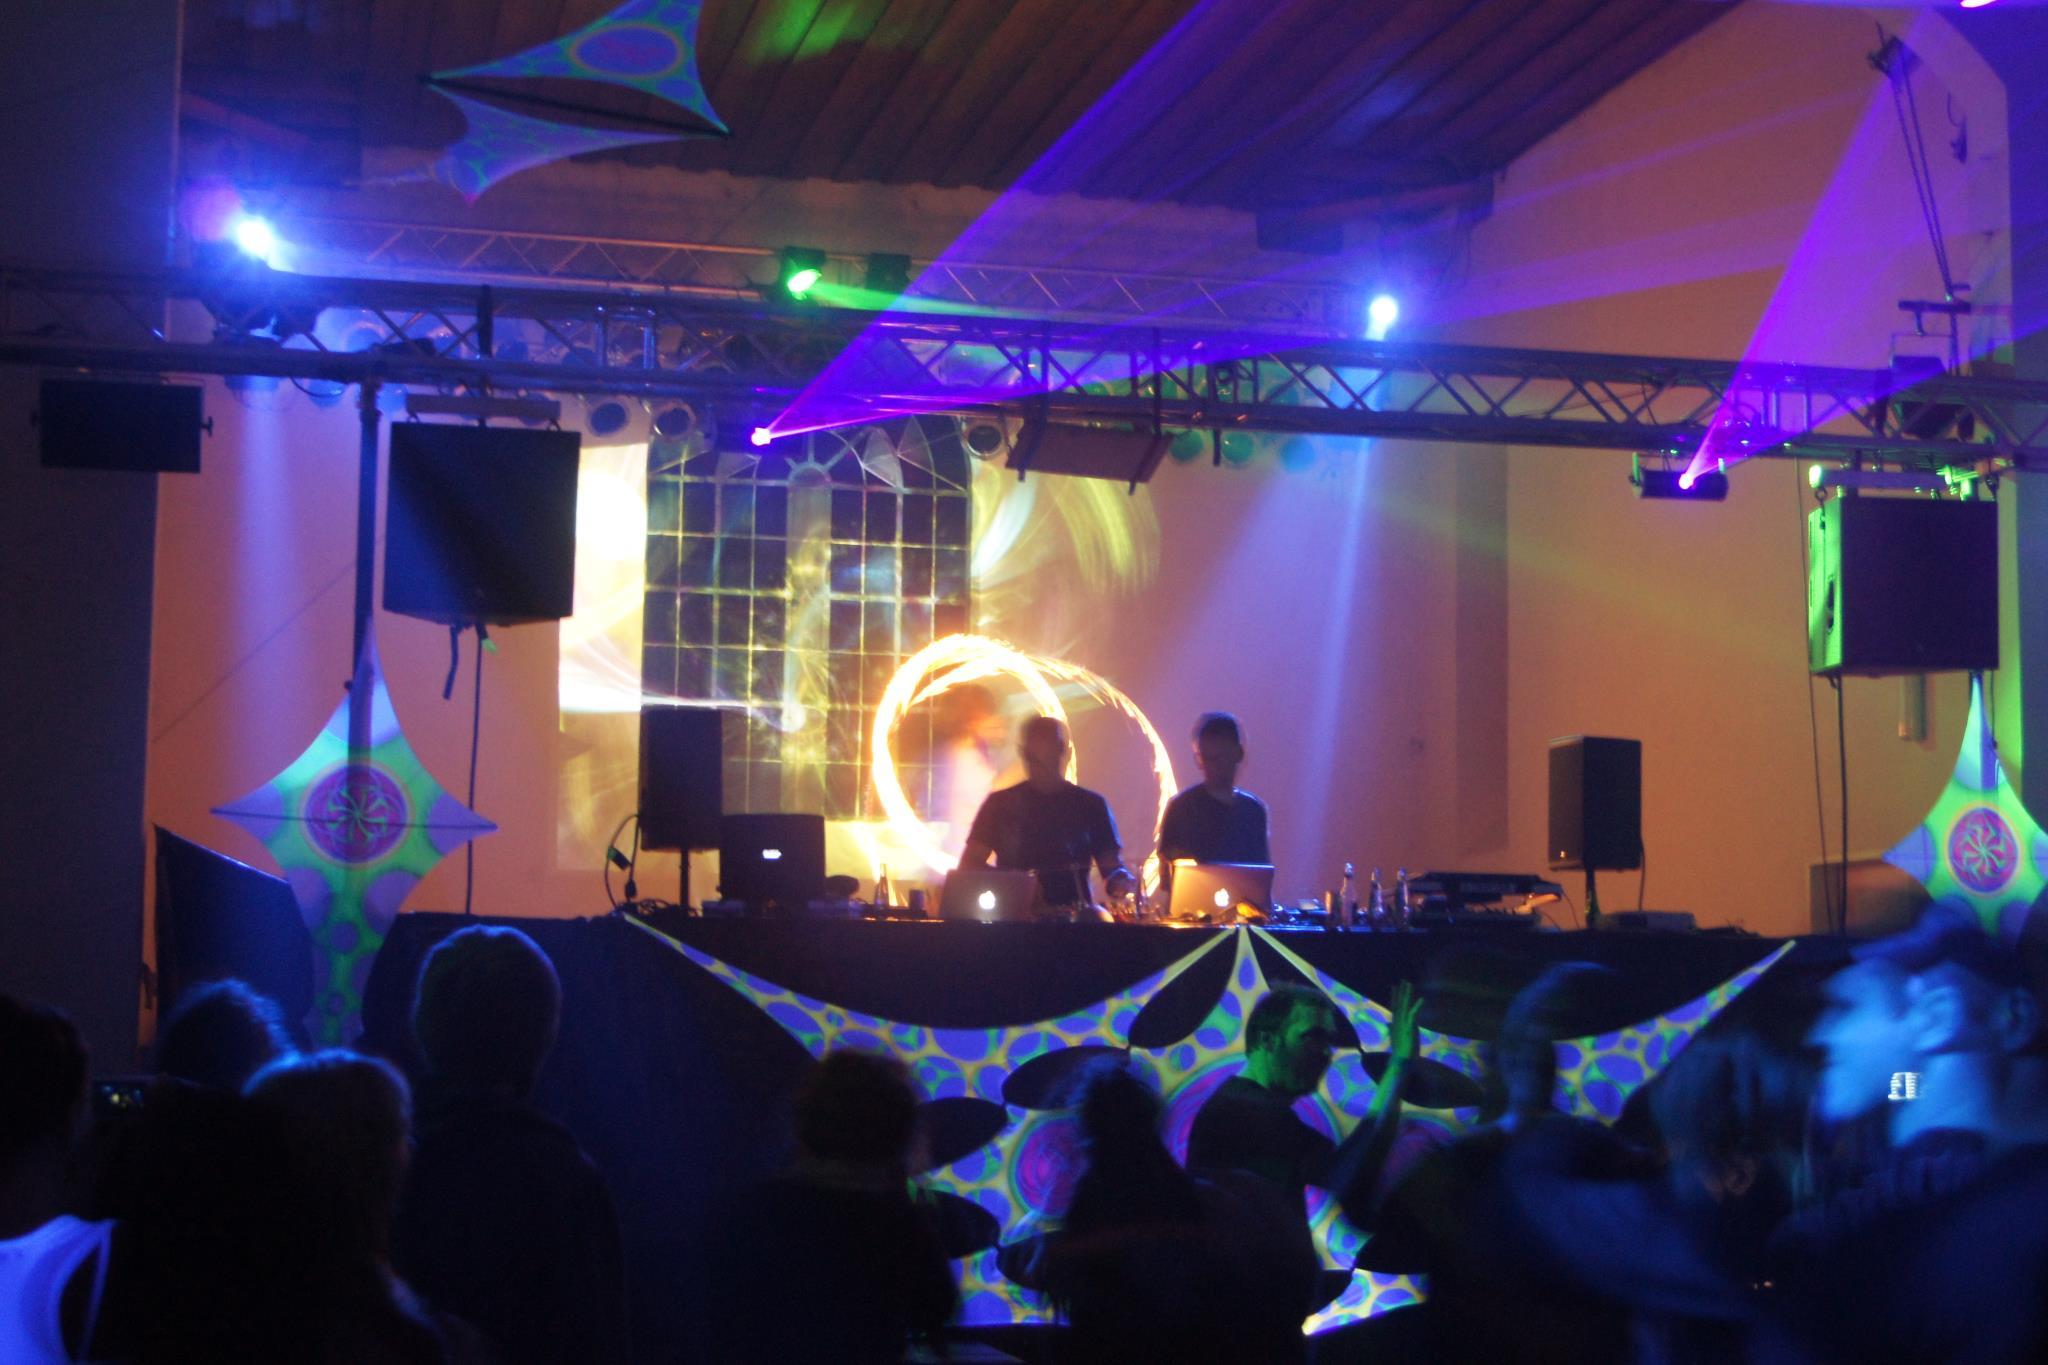 Krypta_Chapel_Goeppingen_by_SK-audio-UG